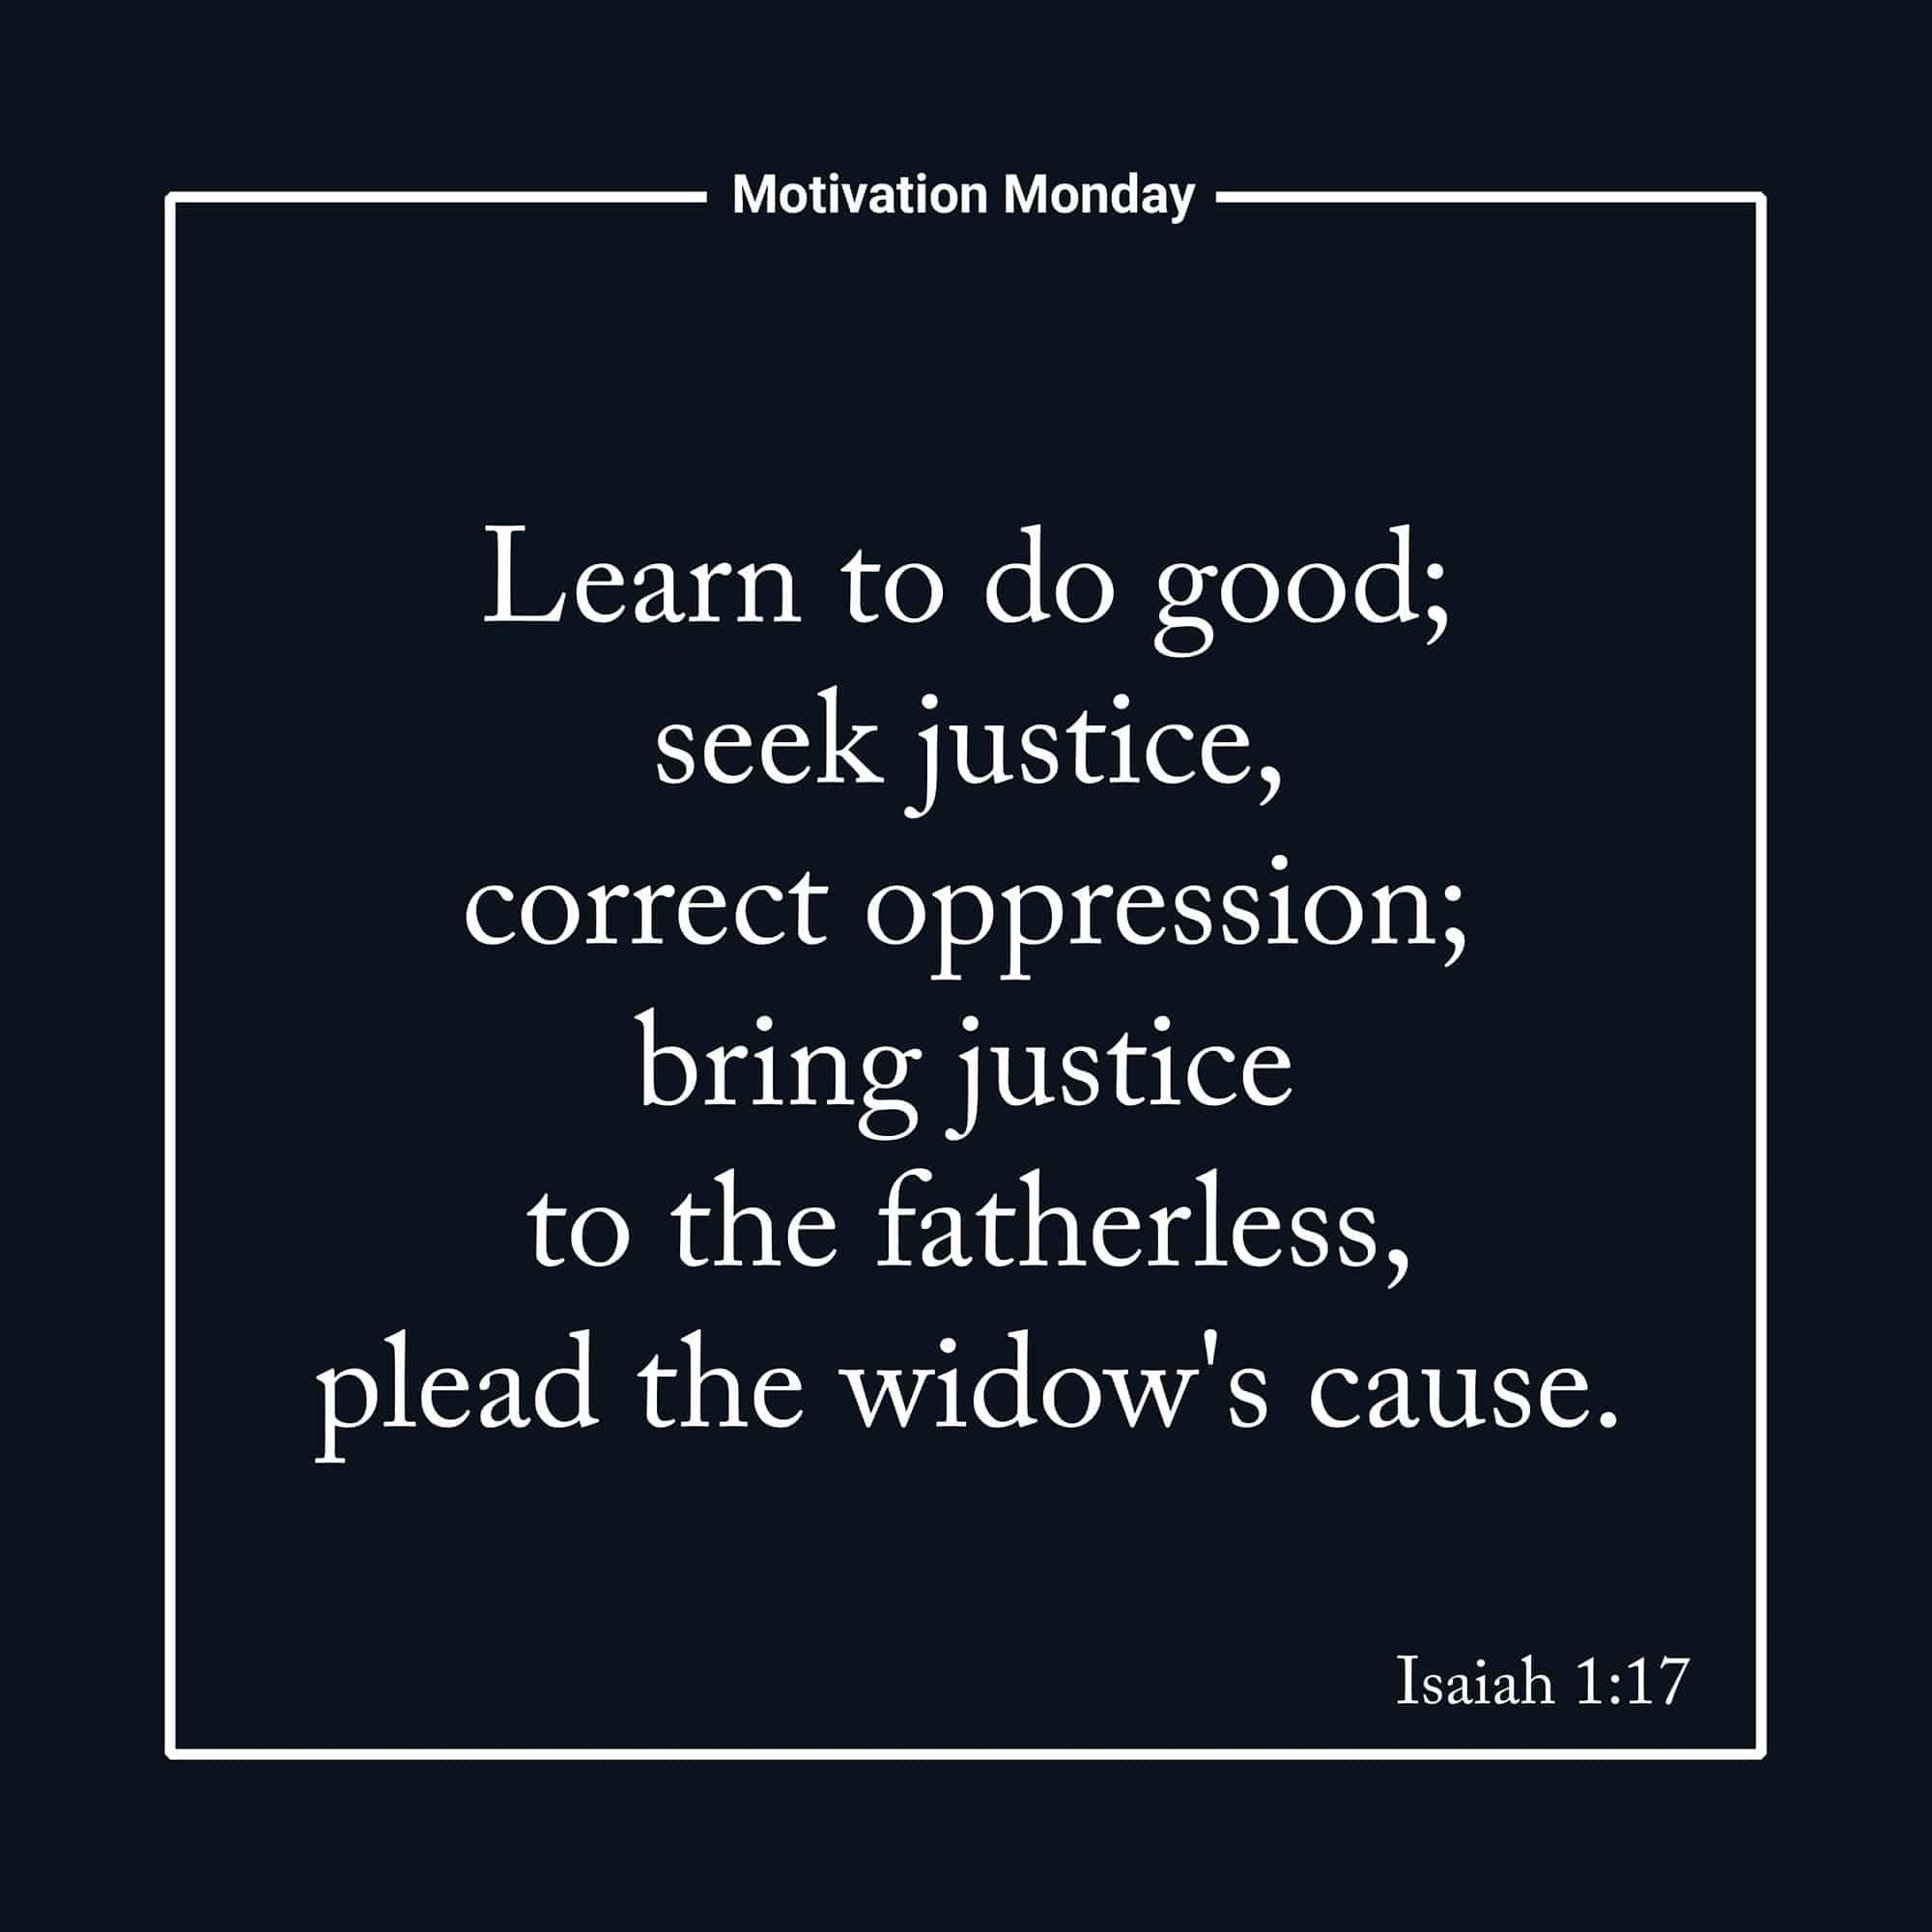 Isaiah 1:17